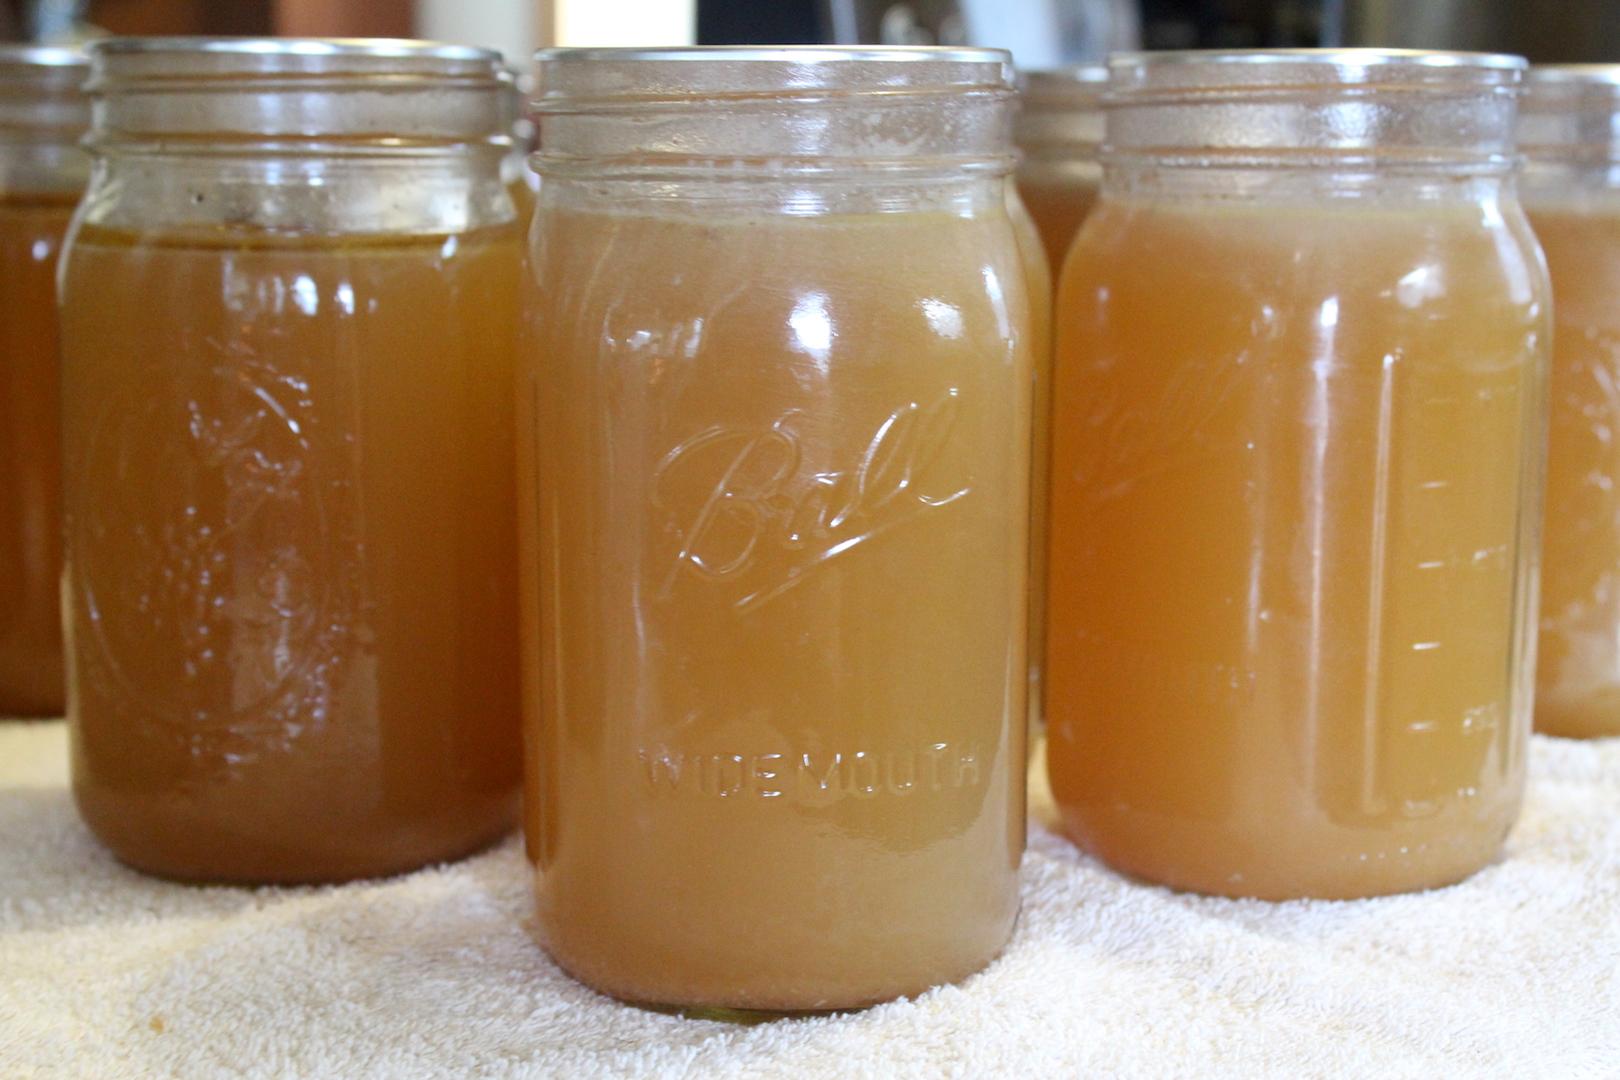 Shelf stable bone broth in canning jars